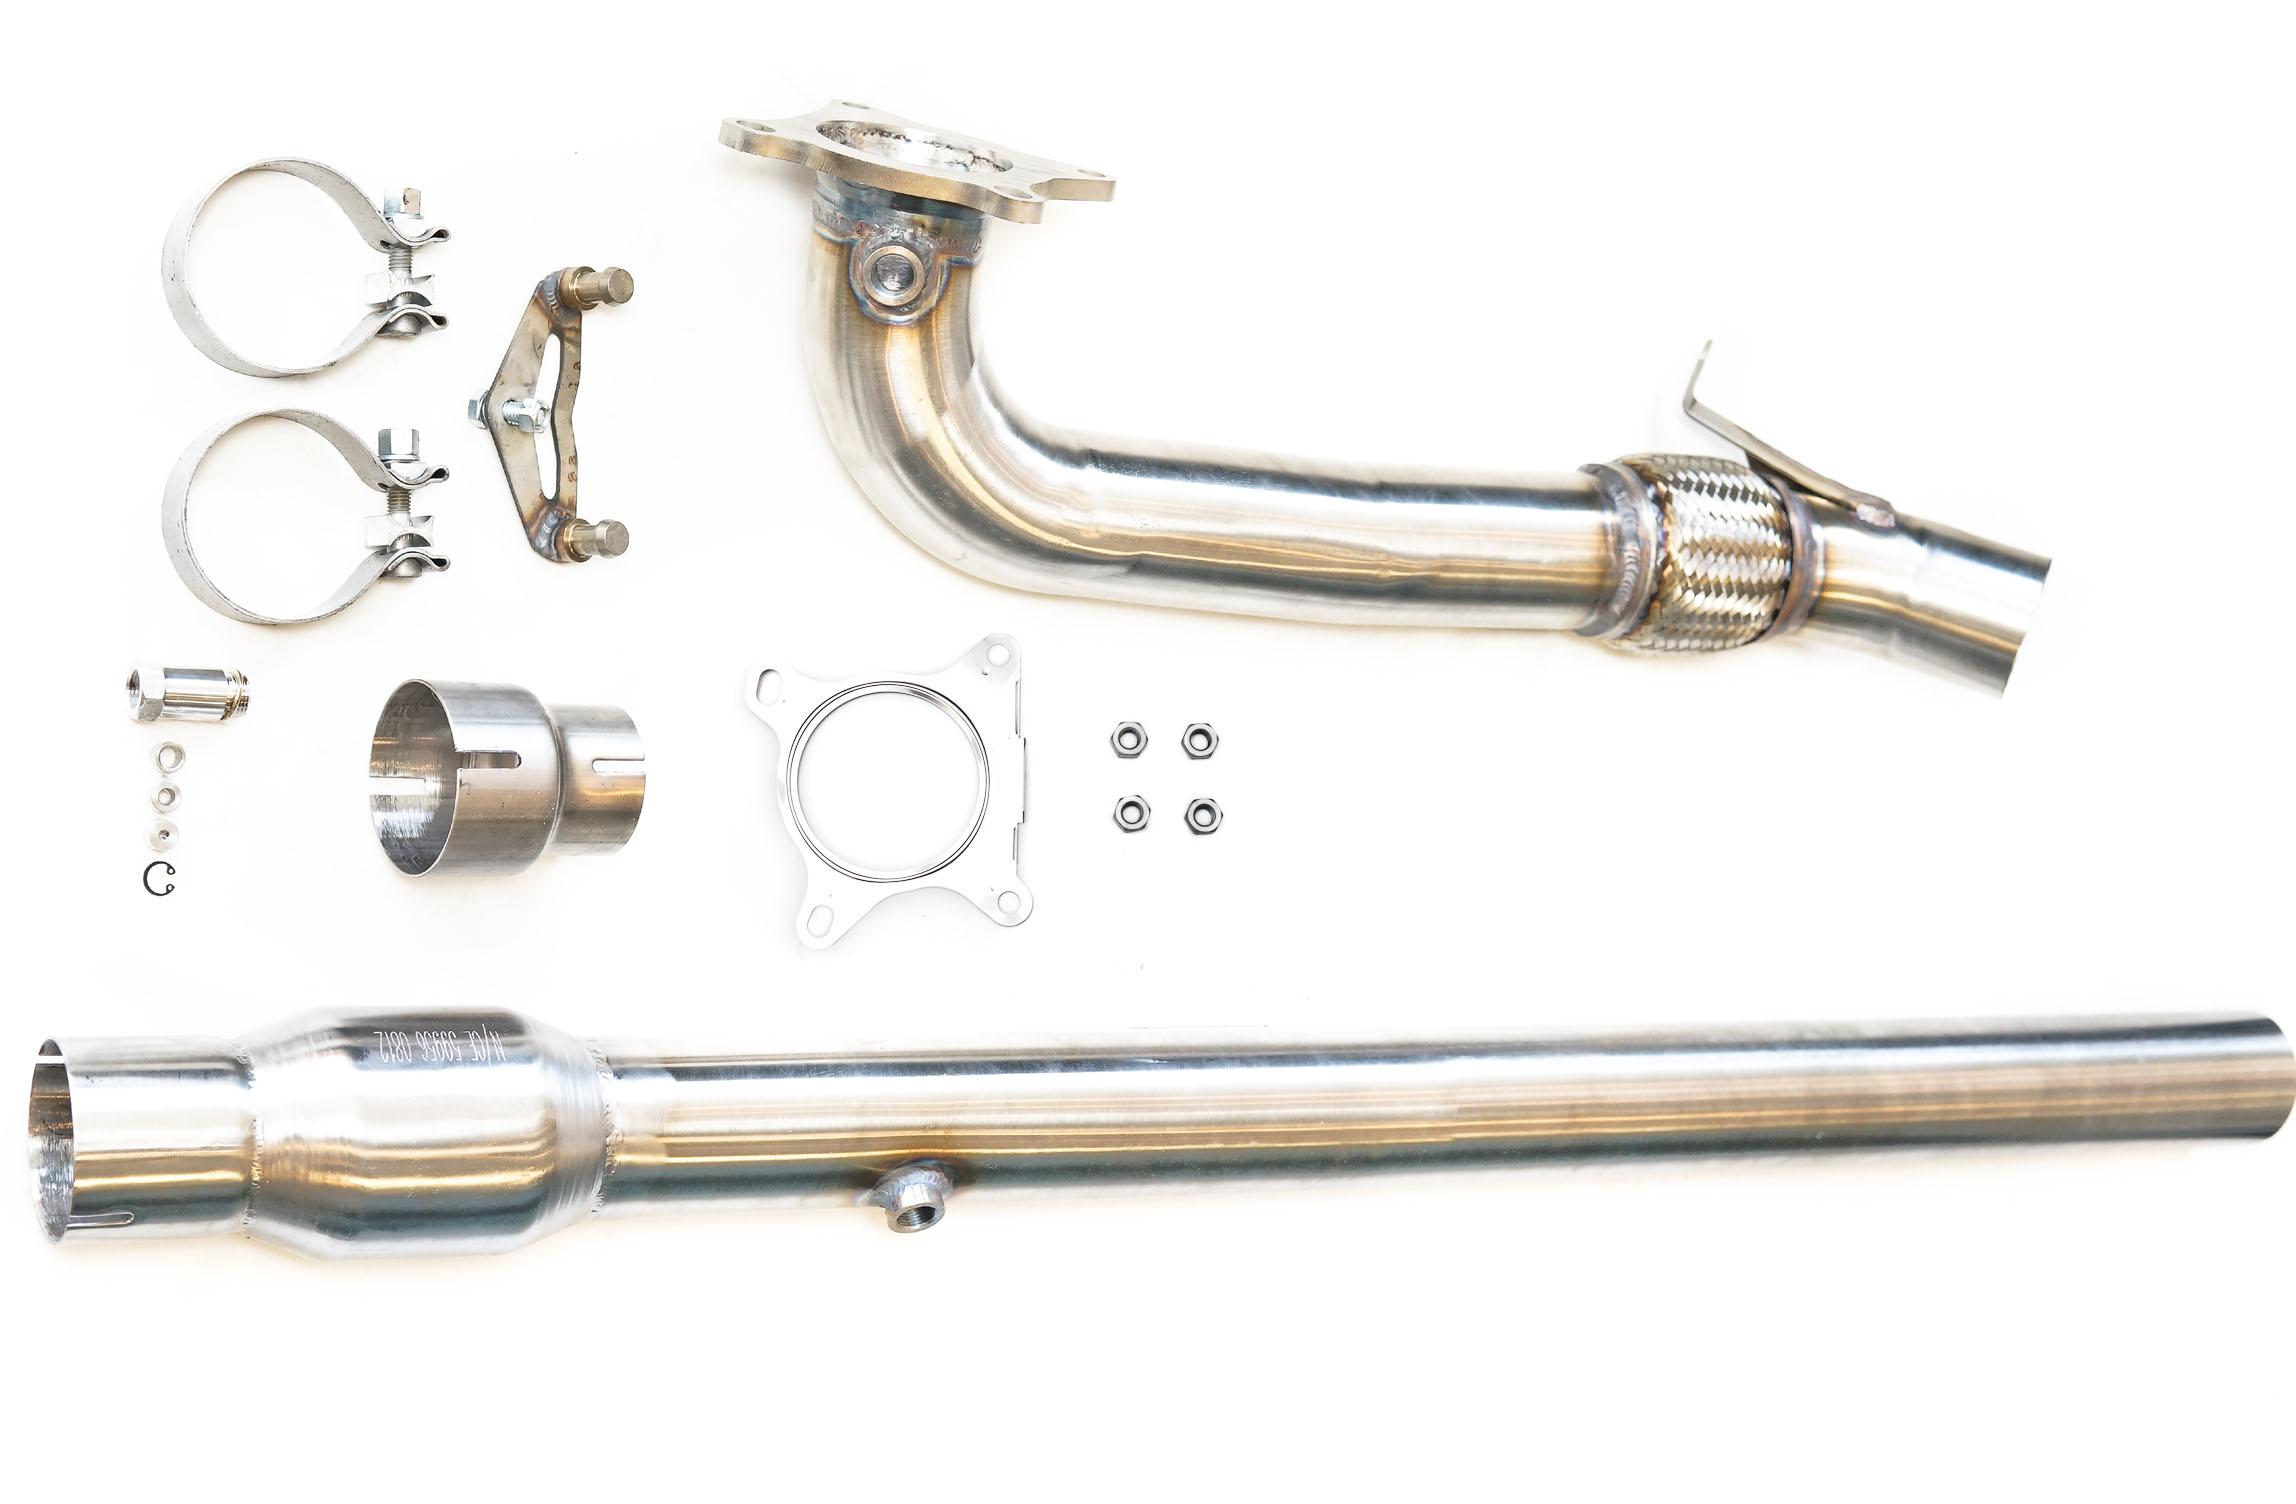 NL Tuning Golf R20 2.0T 3″ Downpipe Kit